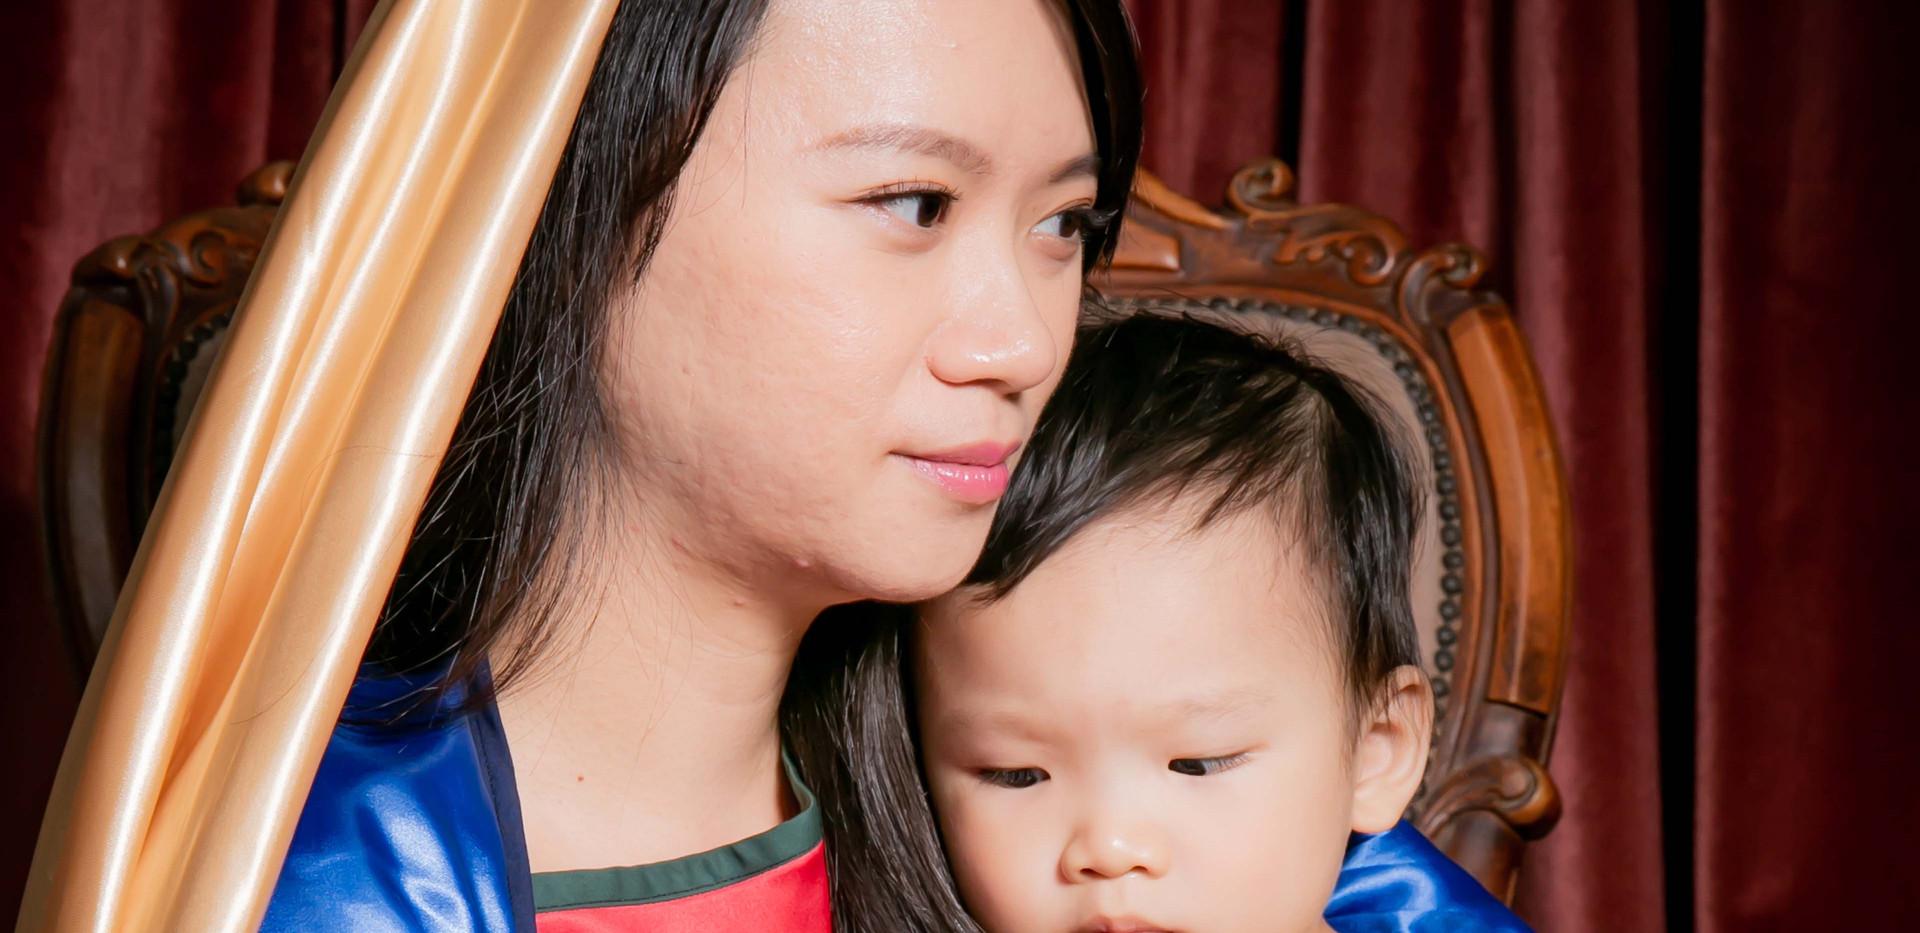 yichiao 21 century madonna and child 4.j